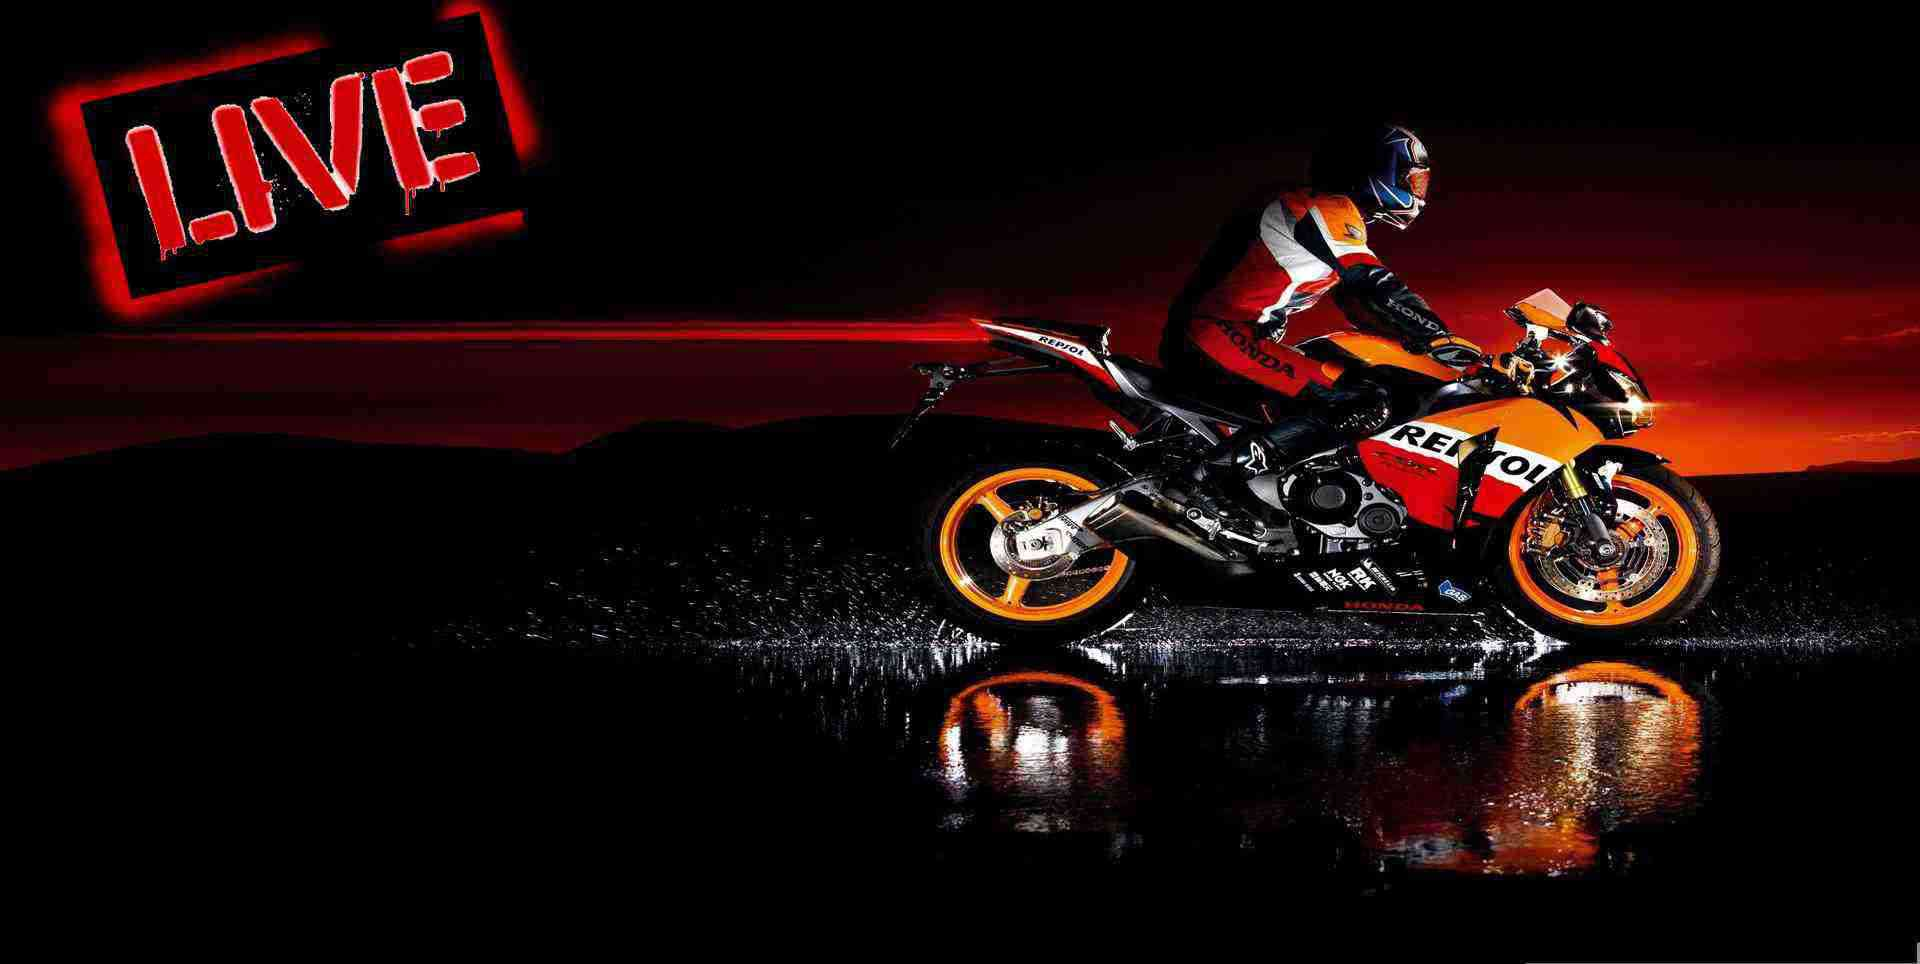 watch-motogp-grand-prix-of-italy-2015-live